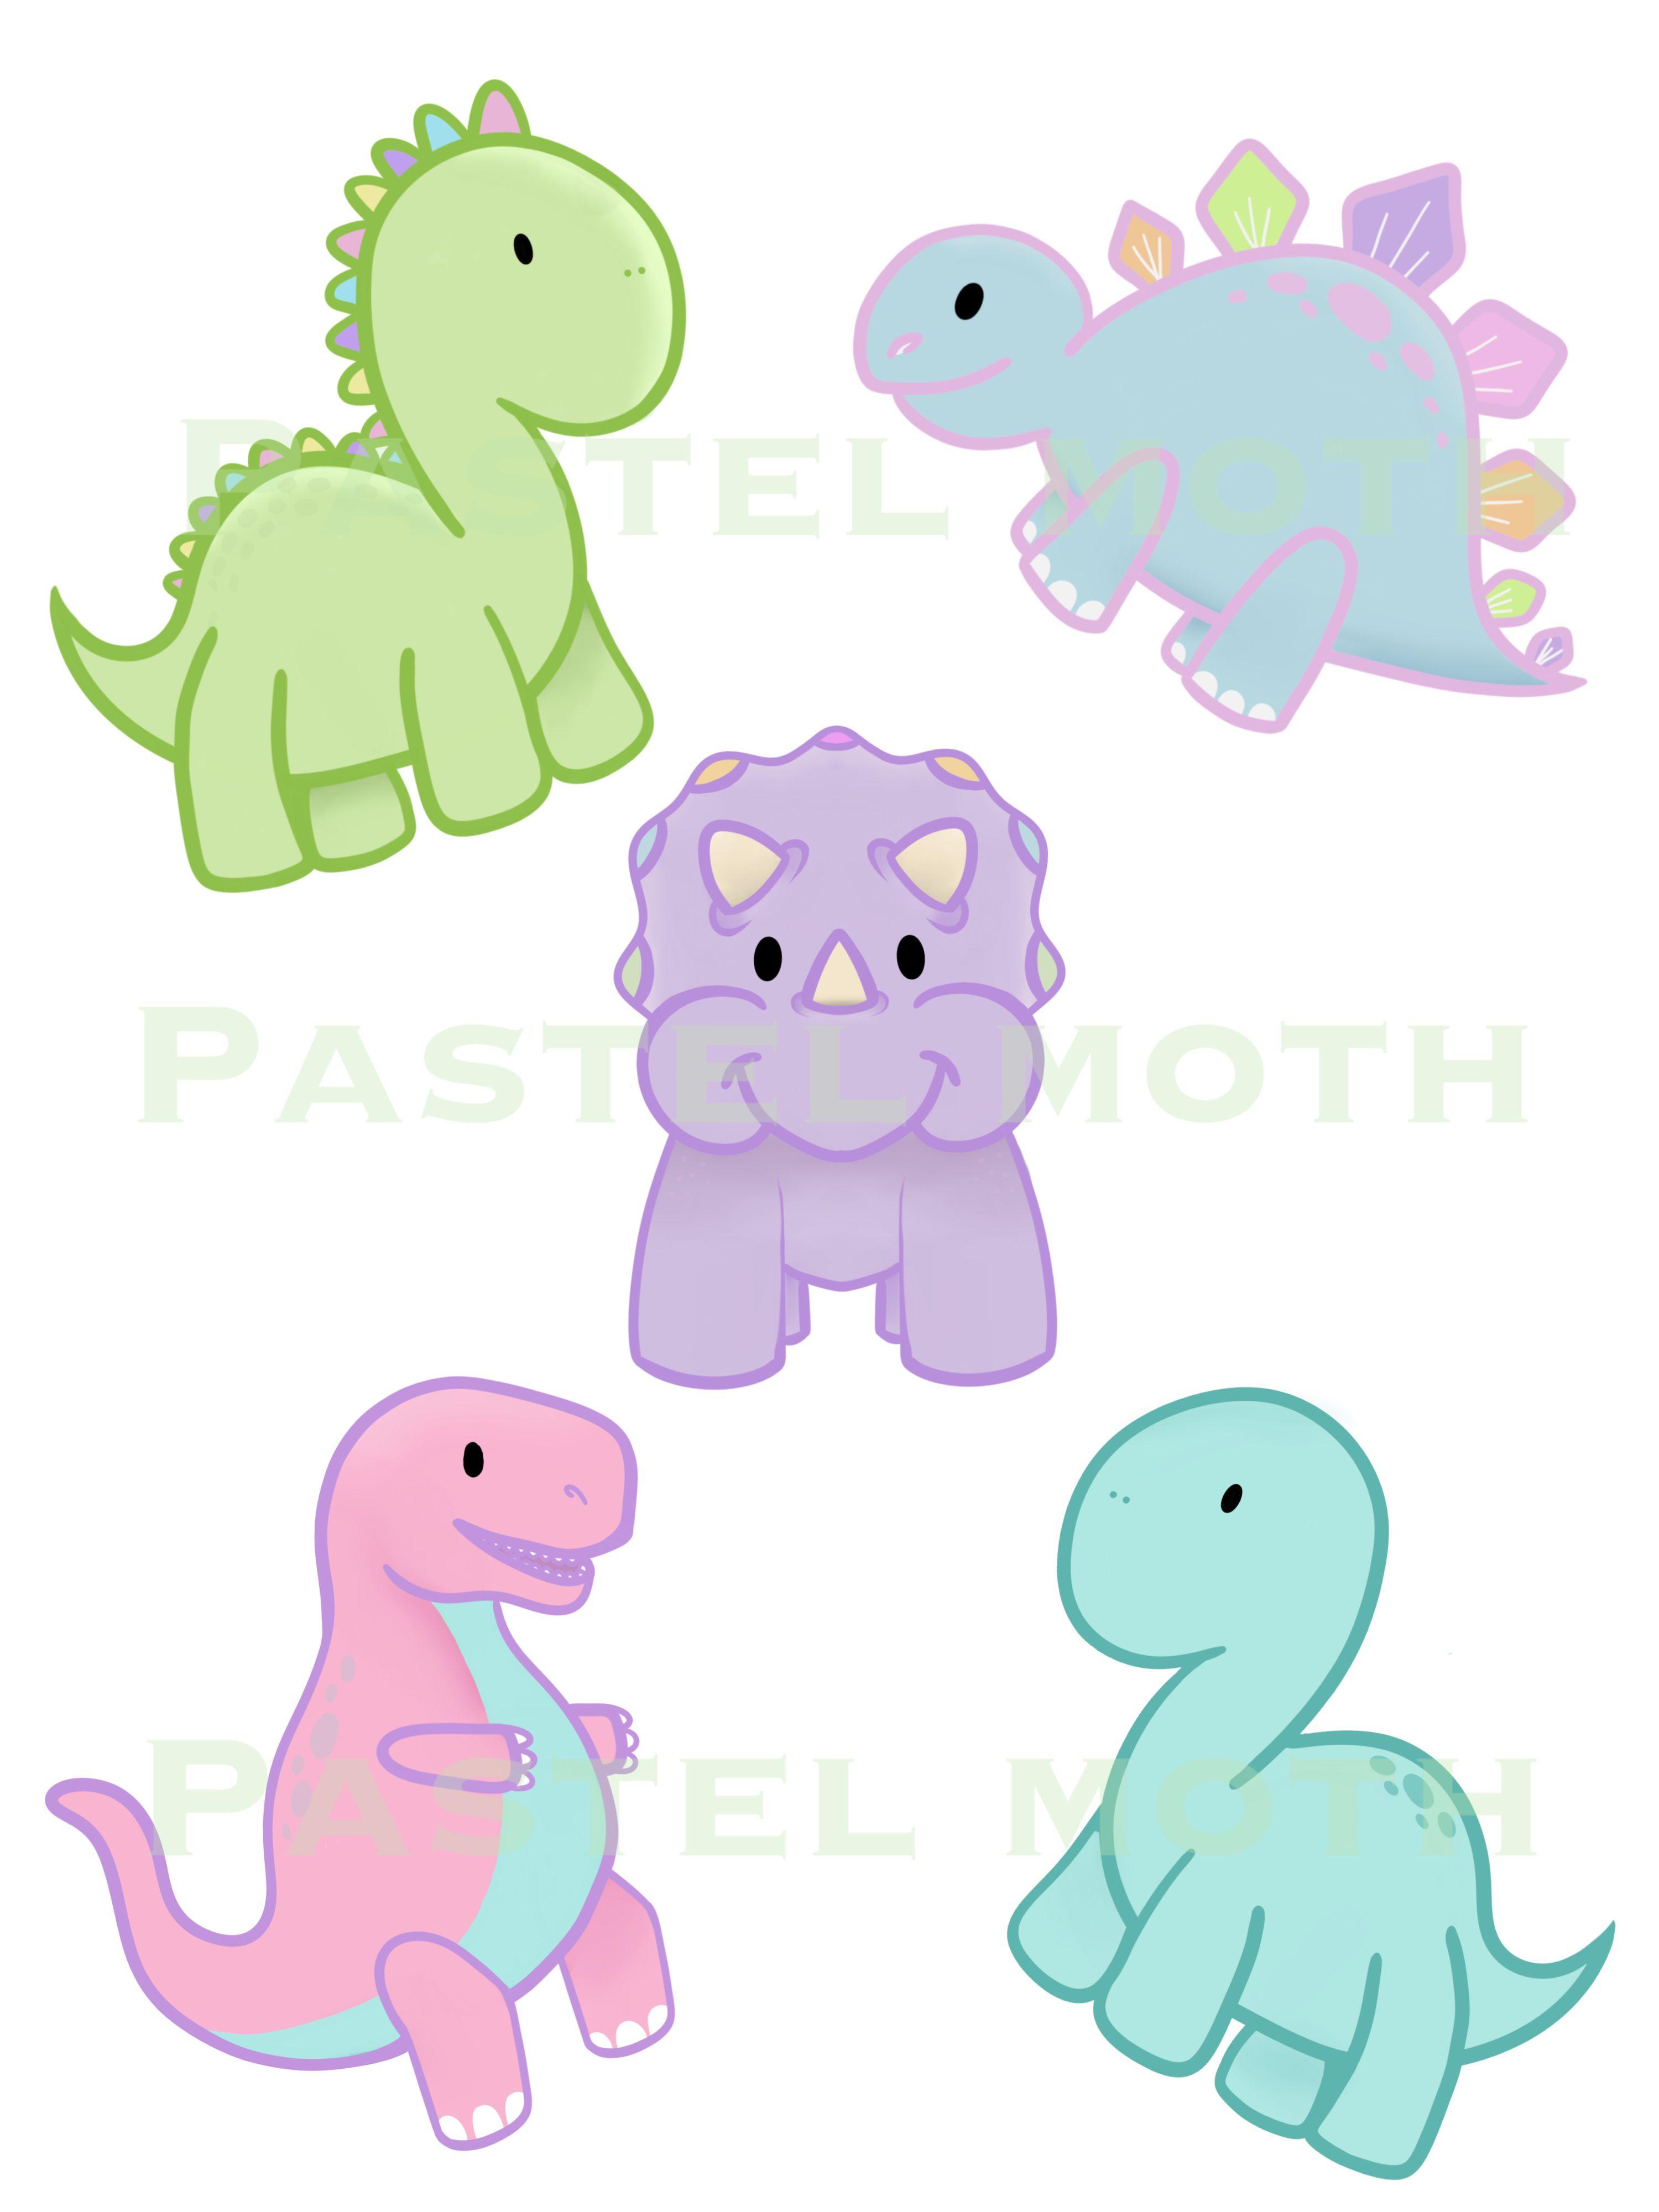 Cute pastel dinosaur clipart PNG jpeg DIGITAL FILE in 2019.